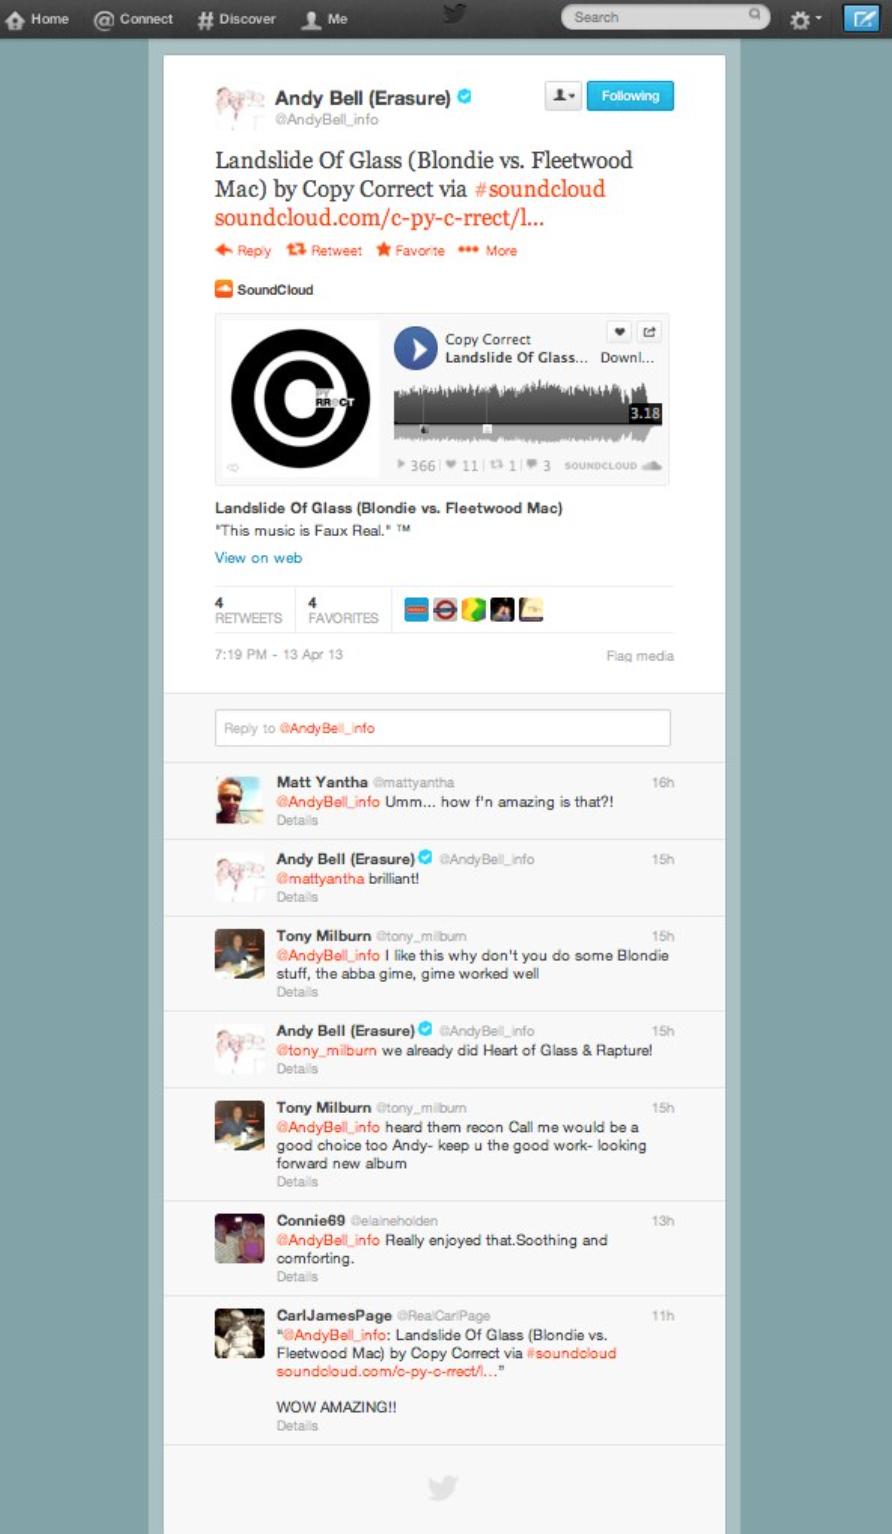 Erasure Twitter support